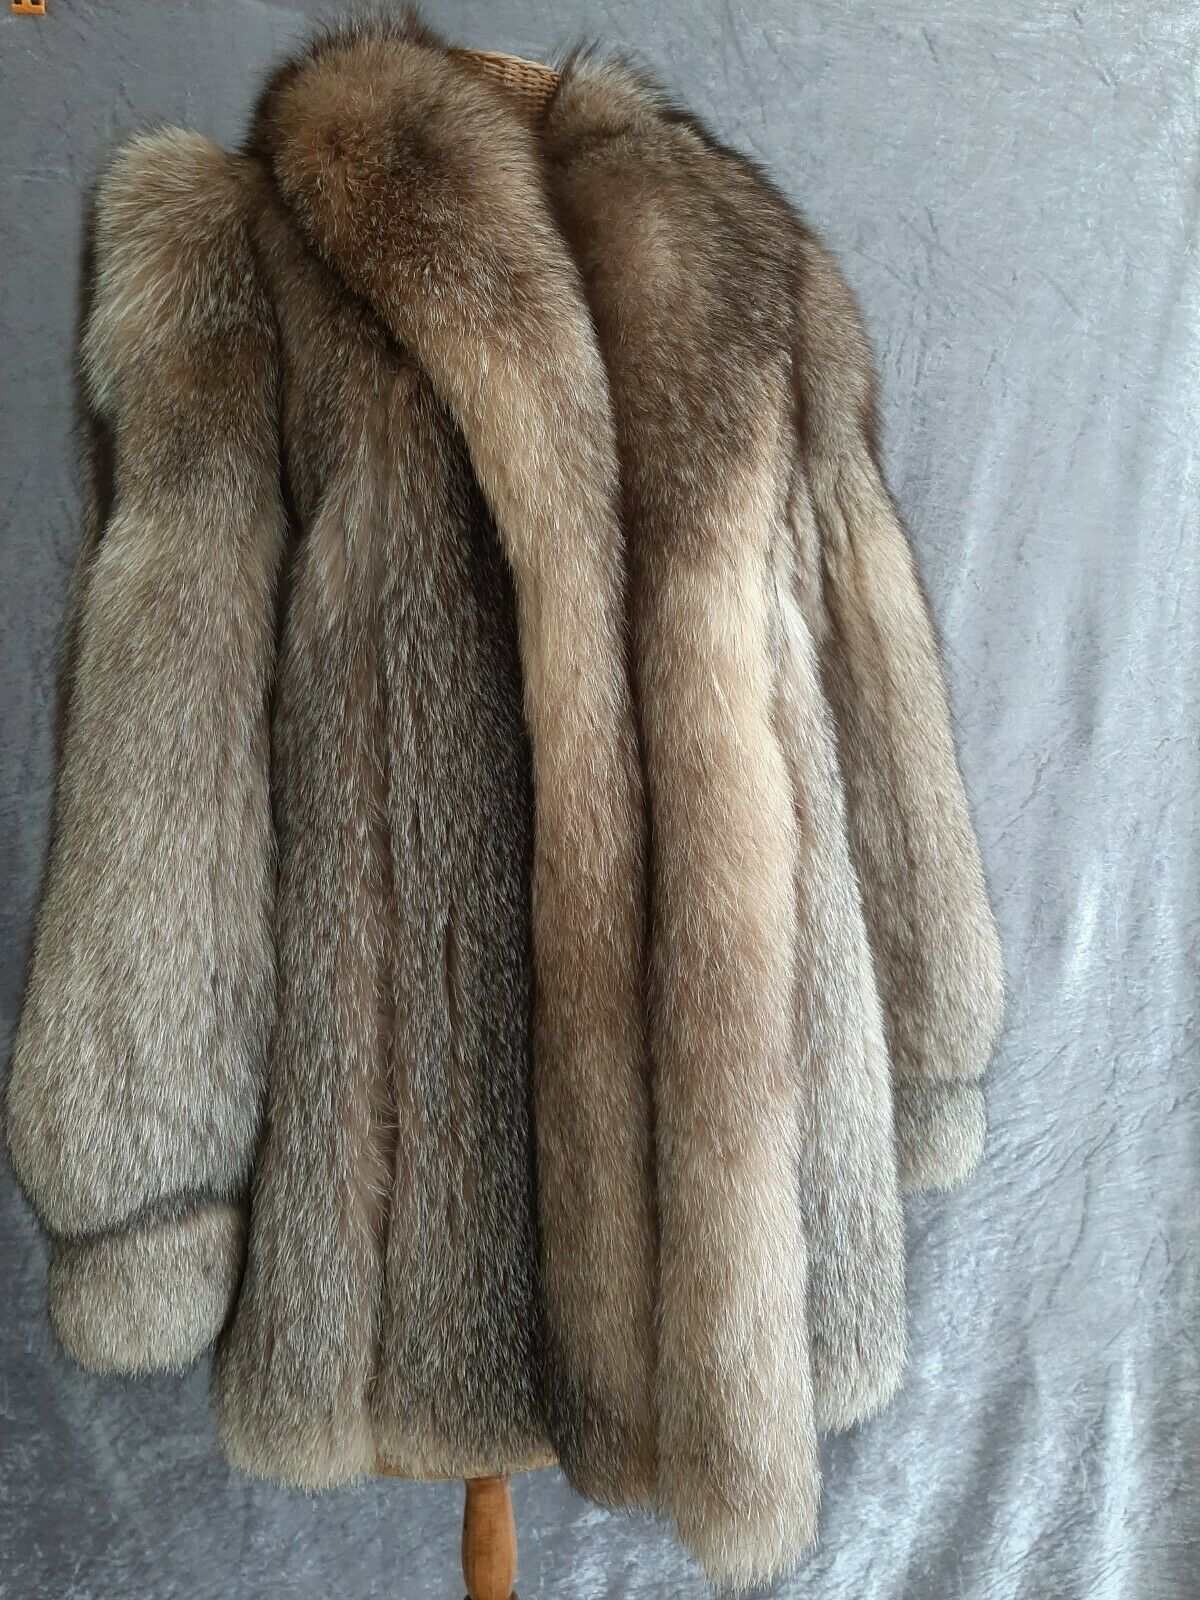 Luxury Cross Fox Coat.rot Silber Copper braun.Echter Pelz, hervorragender Zustand.